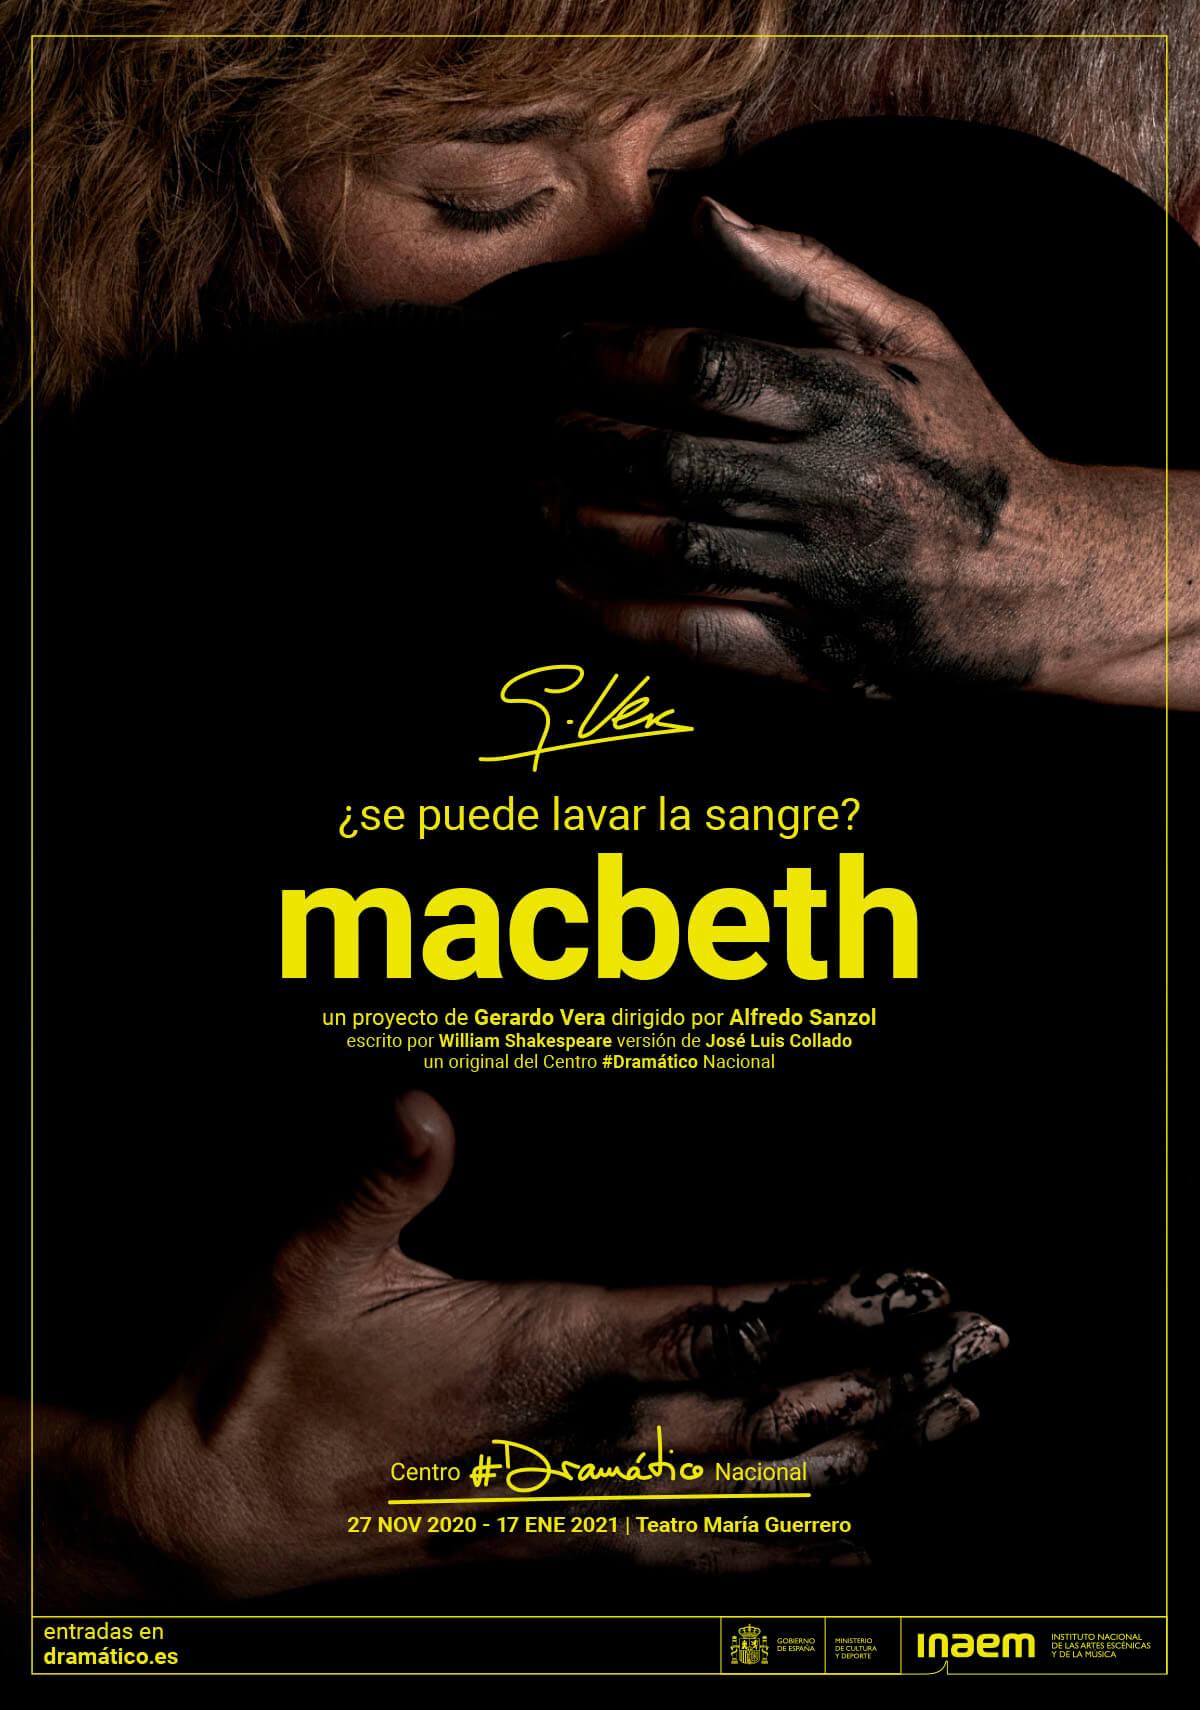 cartel de Macbeth